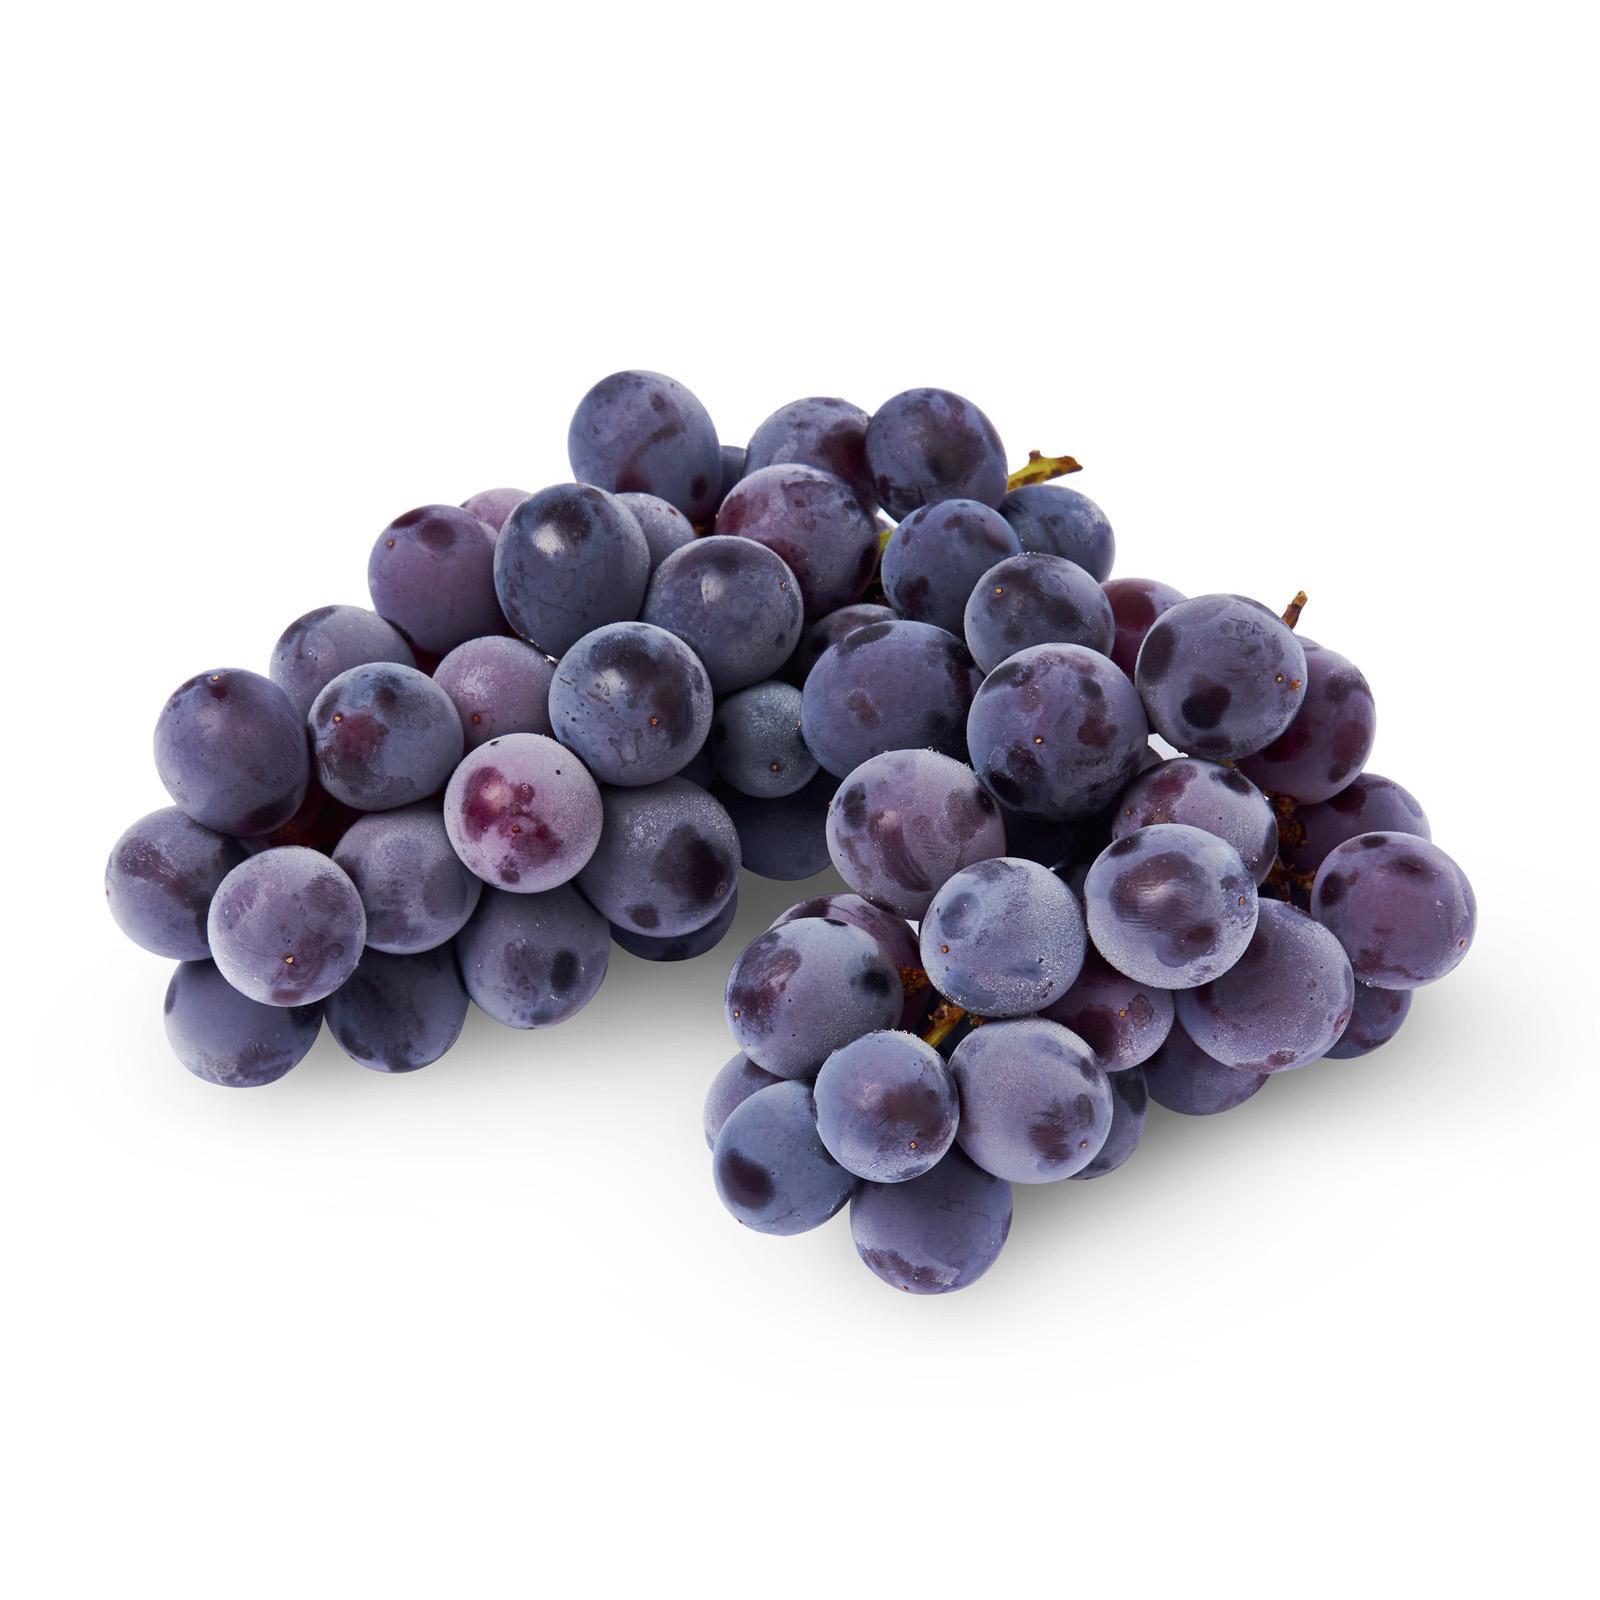 Kirei Japan Premium Fruits - Kyoho Grapes